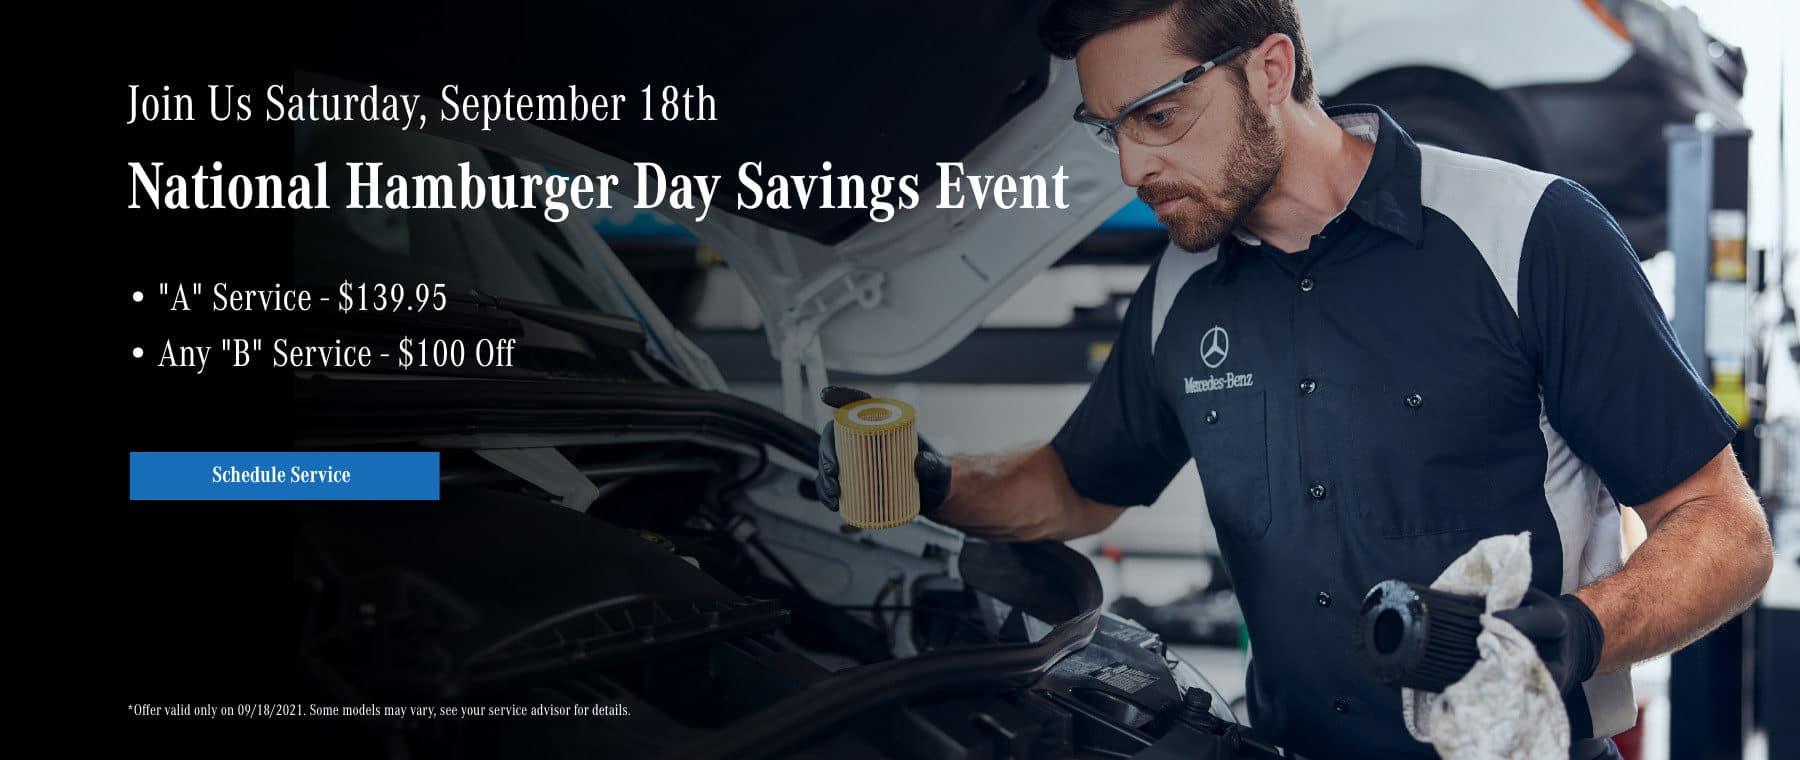 National Hamburger Day Savings Event